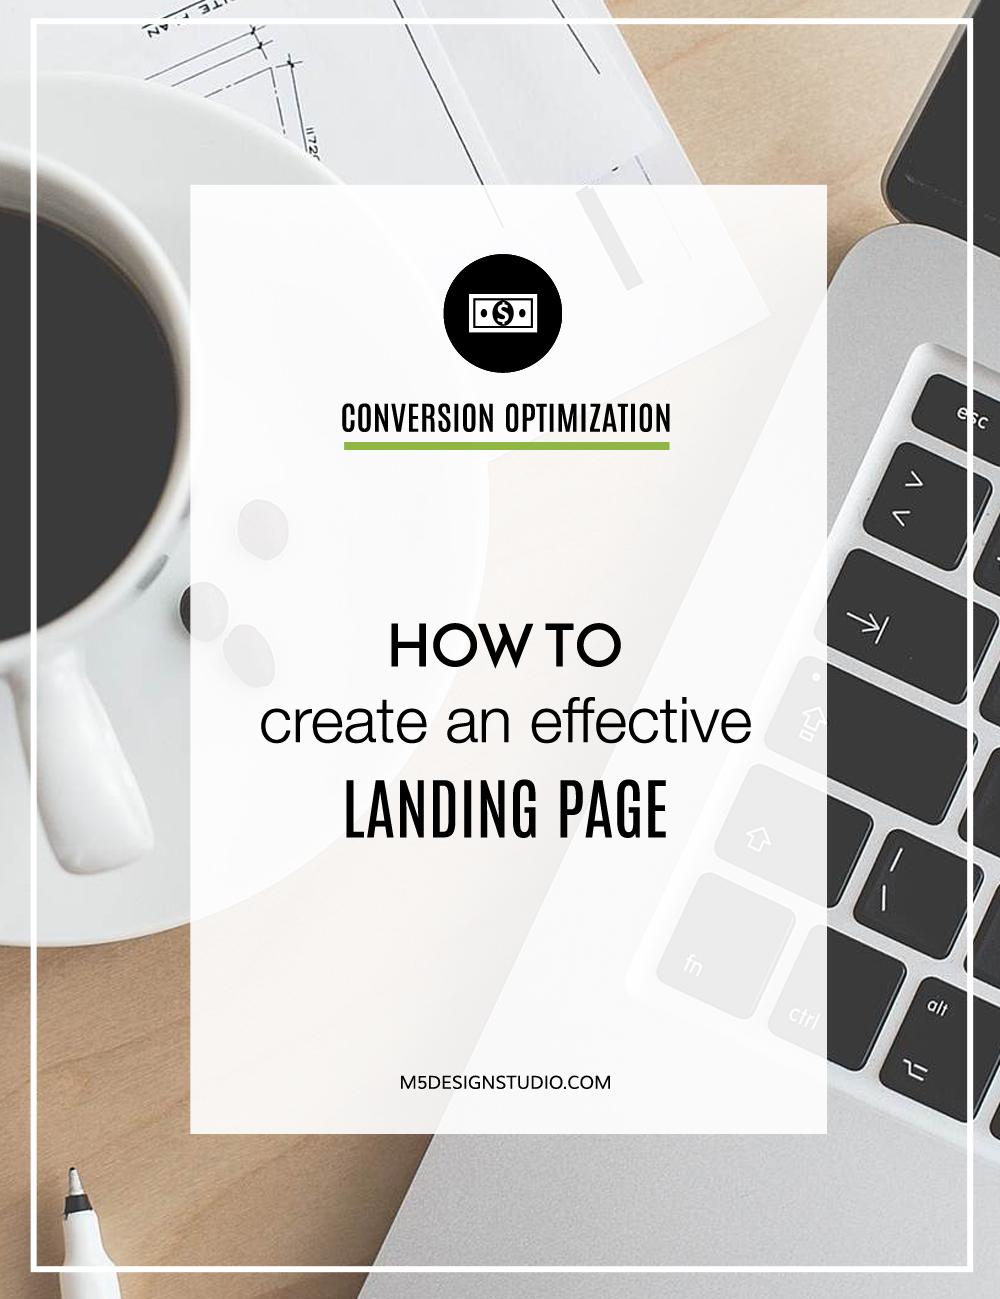 orlando-landing-page-design